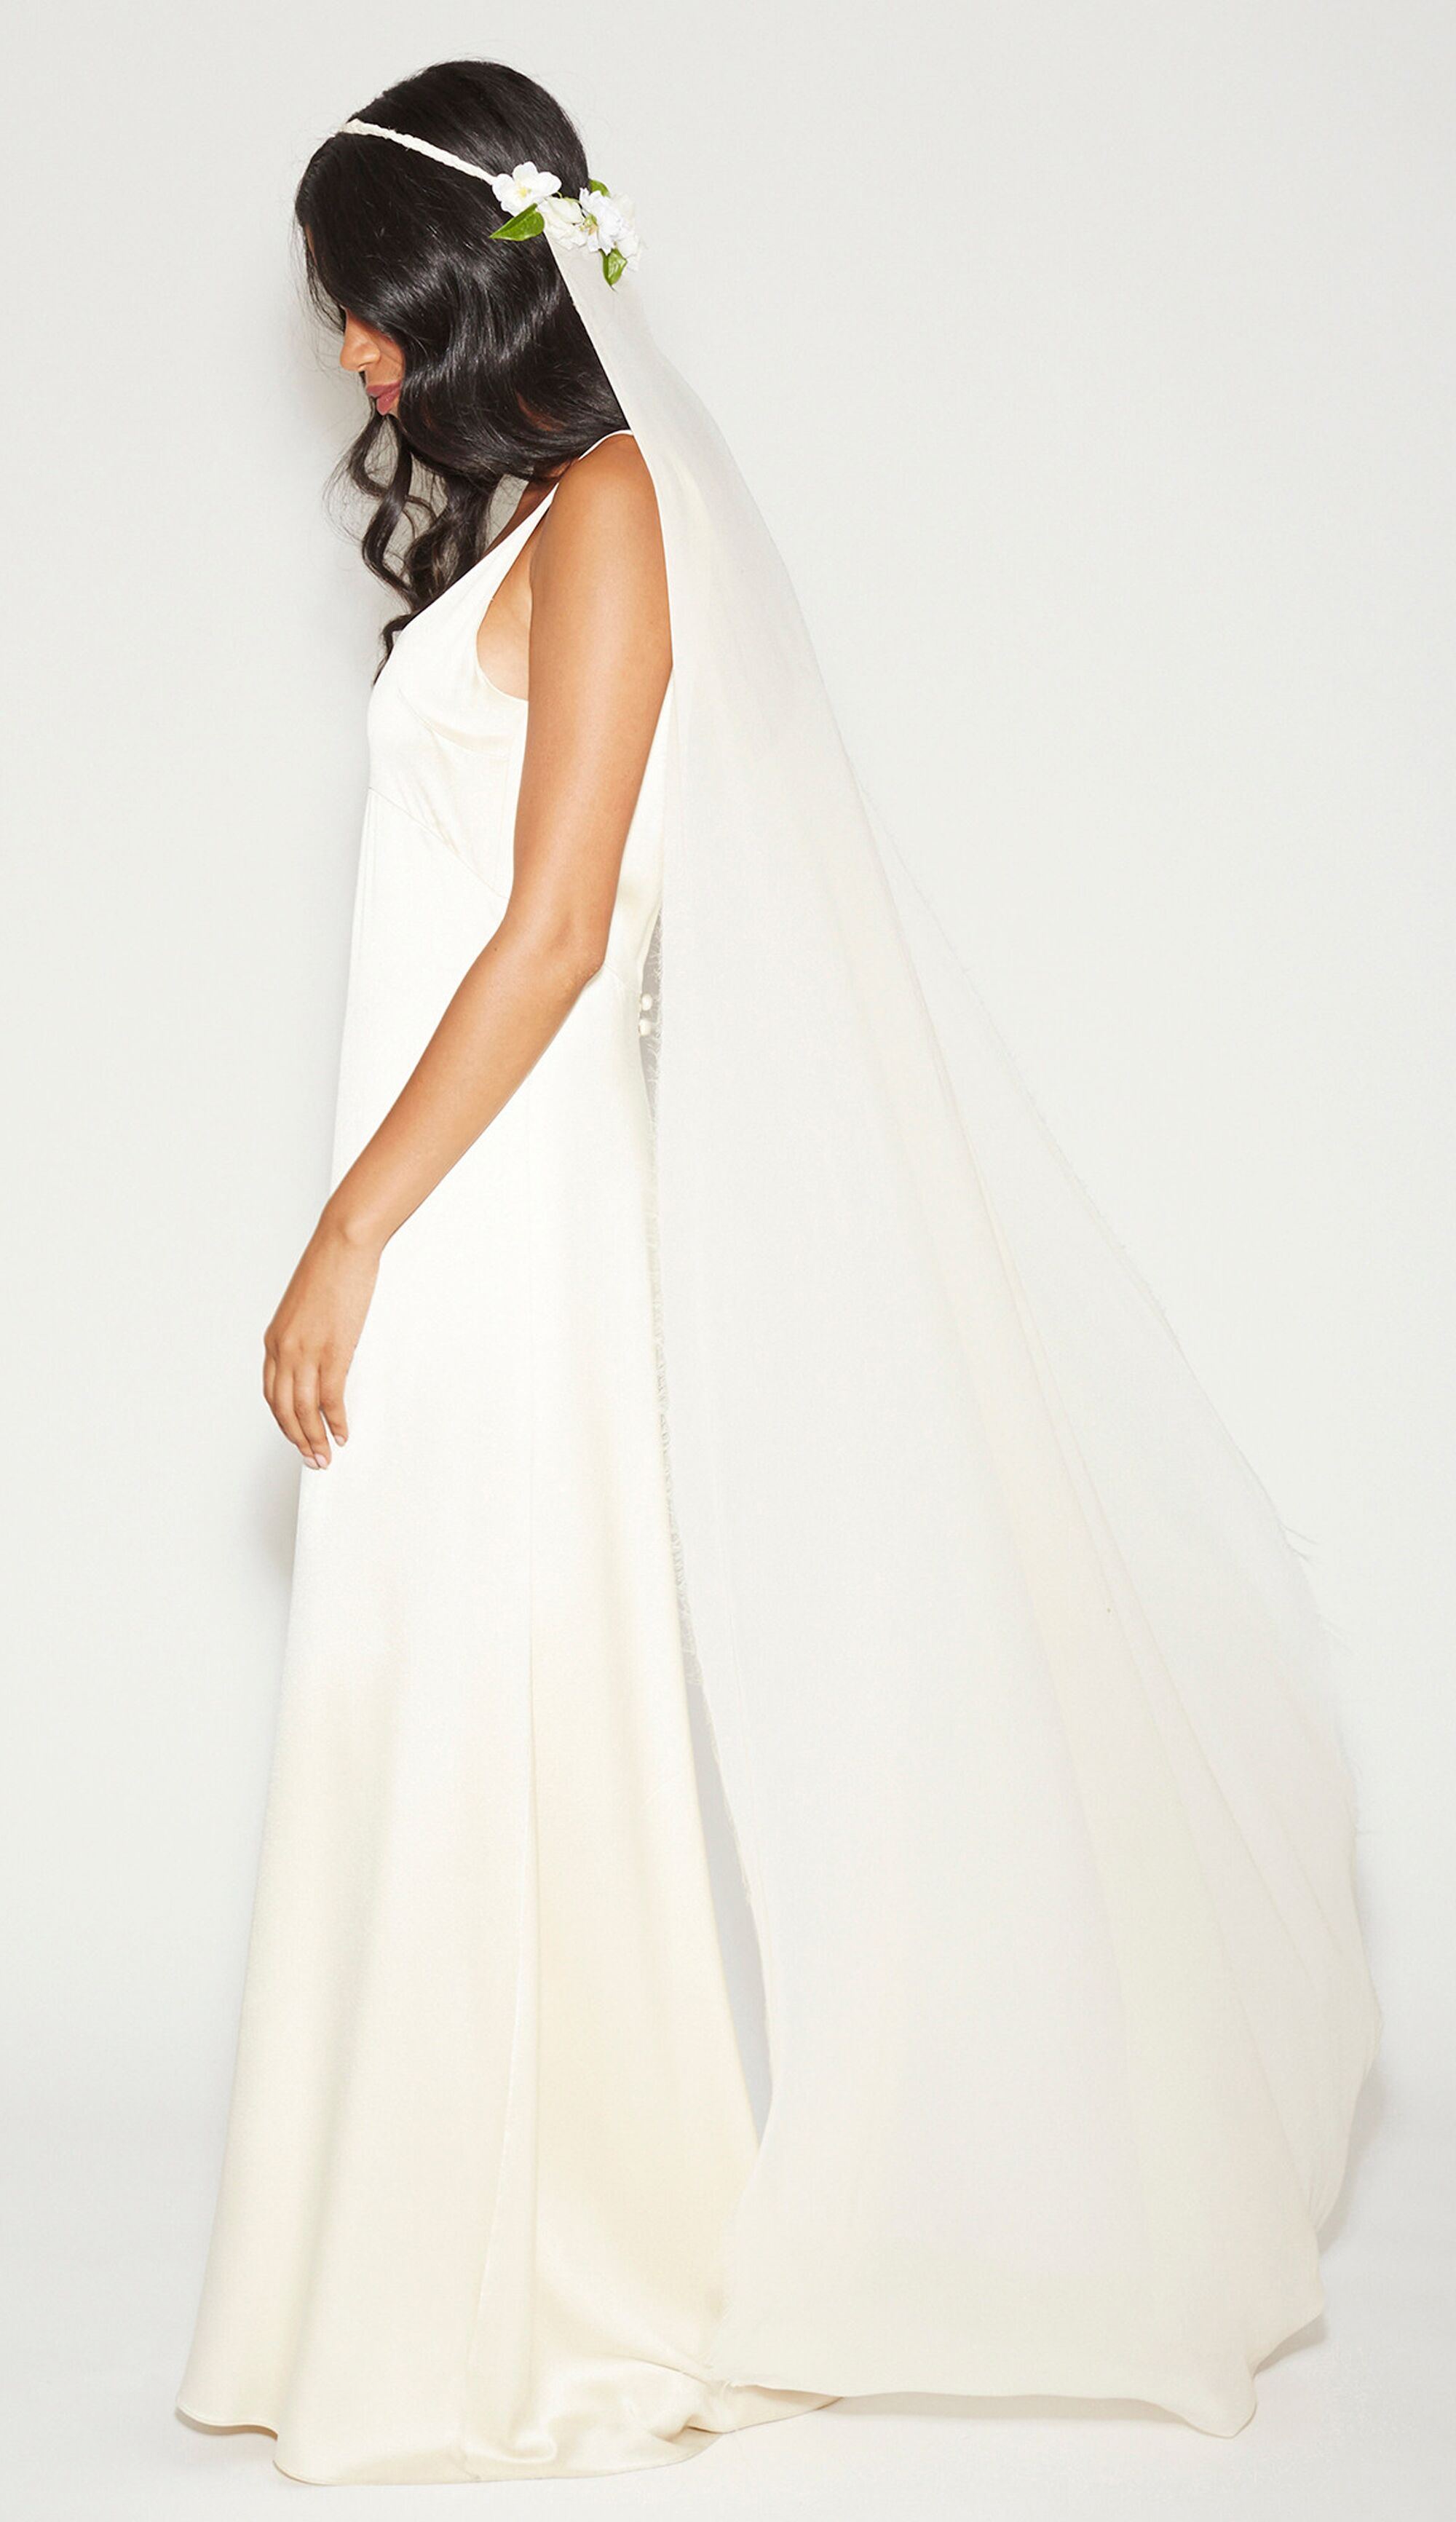 16 Wedding Veil Style Ideas You\'ll Love